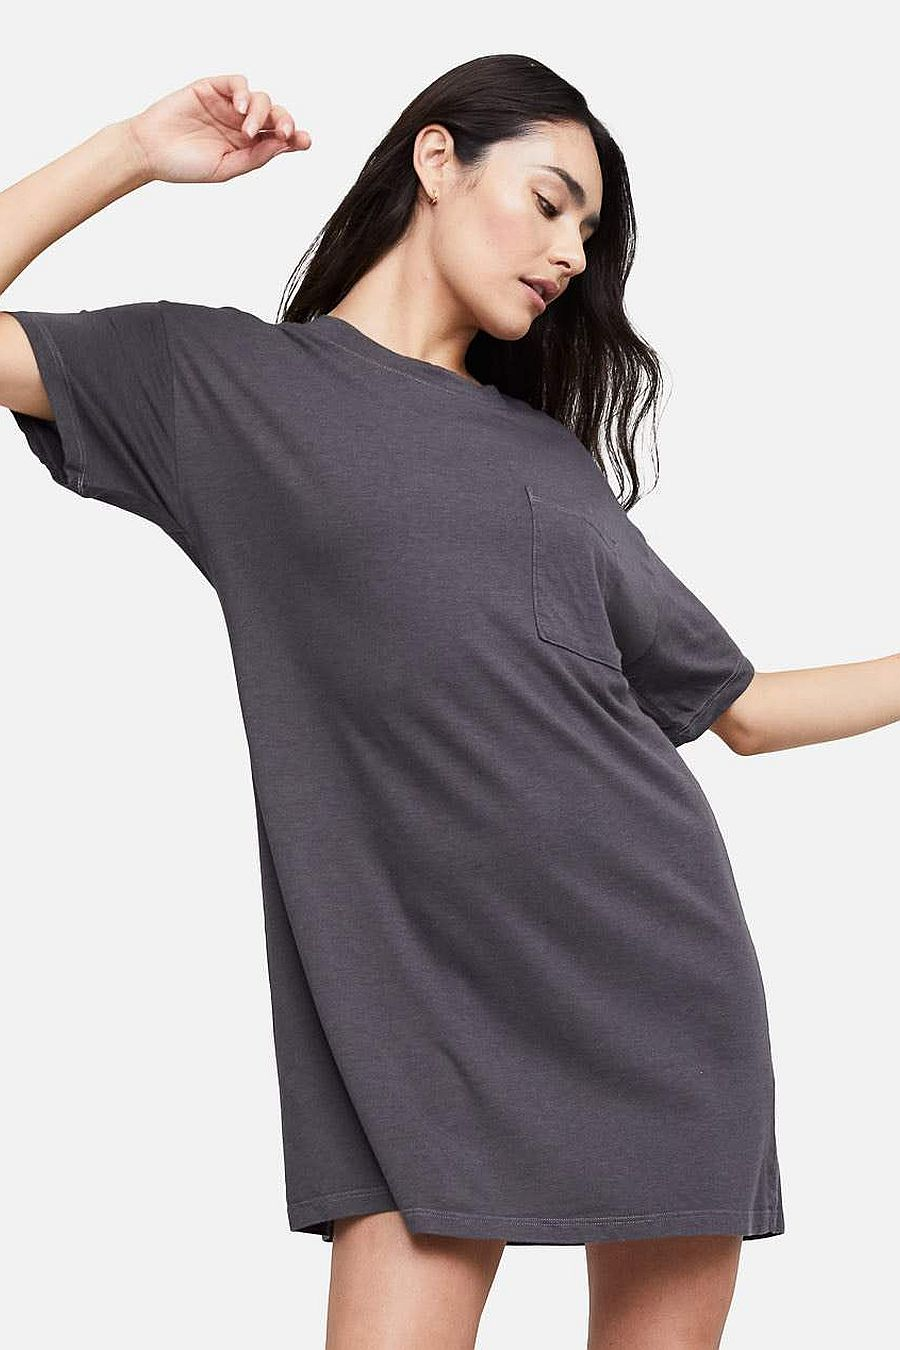 MATE The Label Tencel Sleep Tee Dress - CHARCOAL